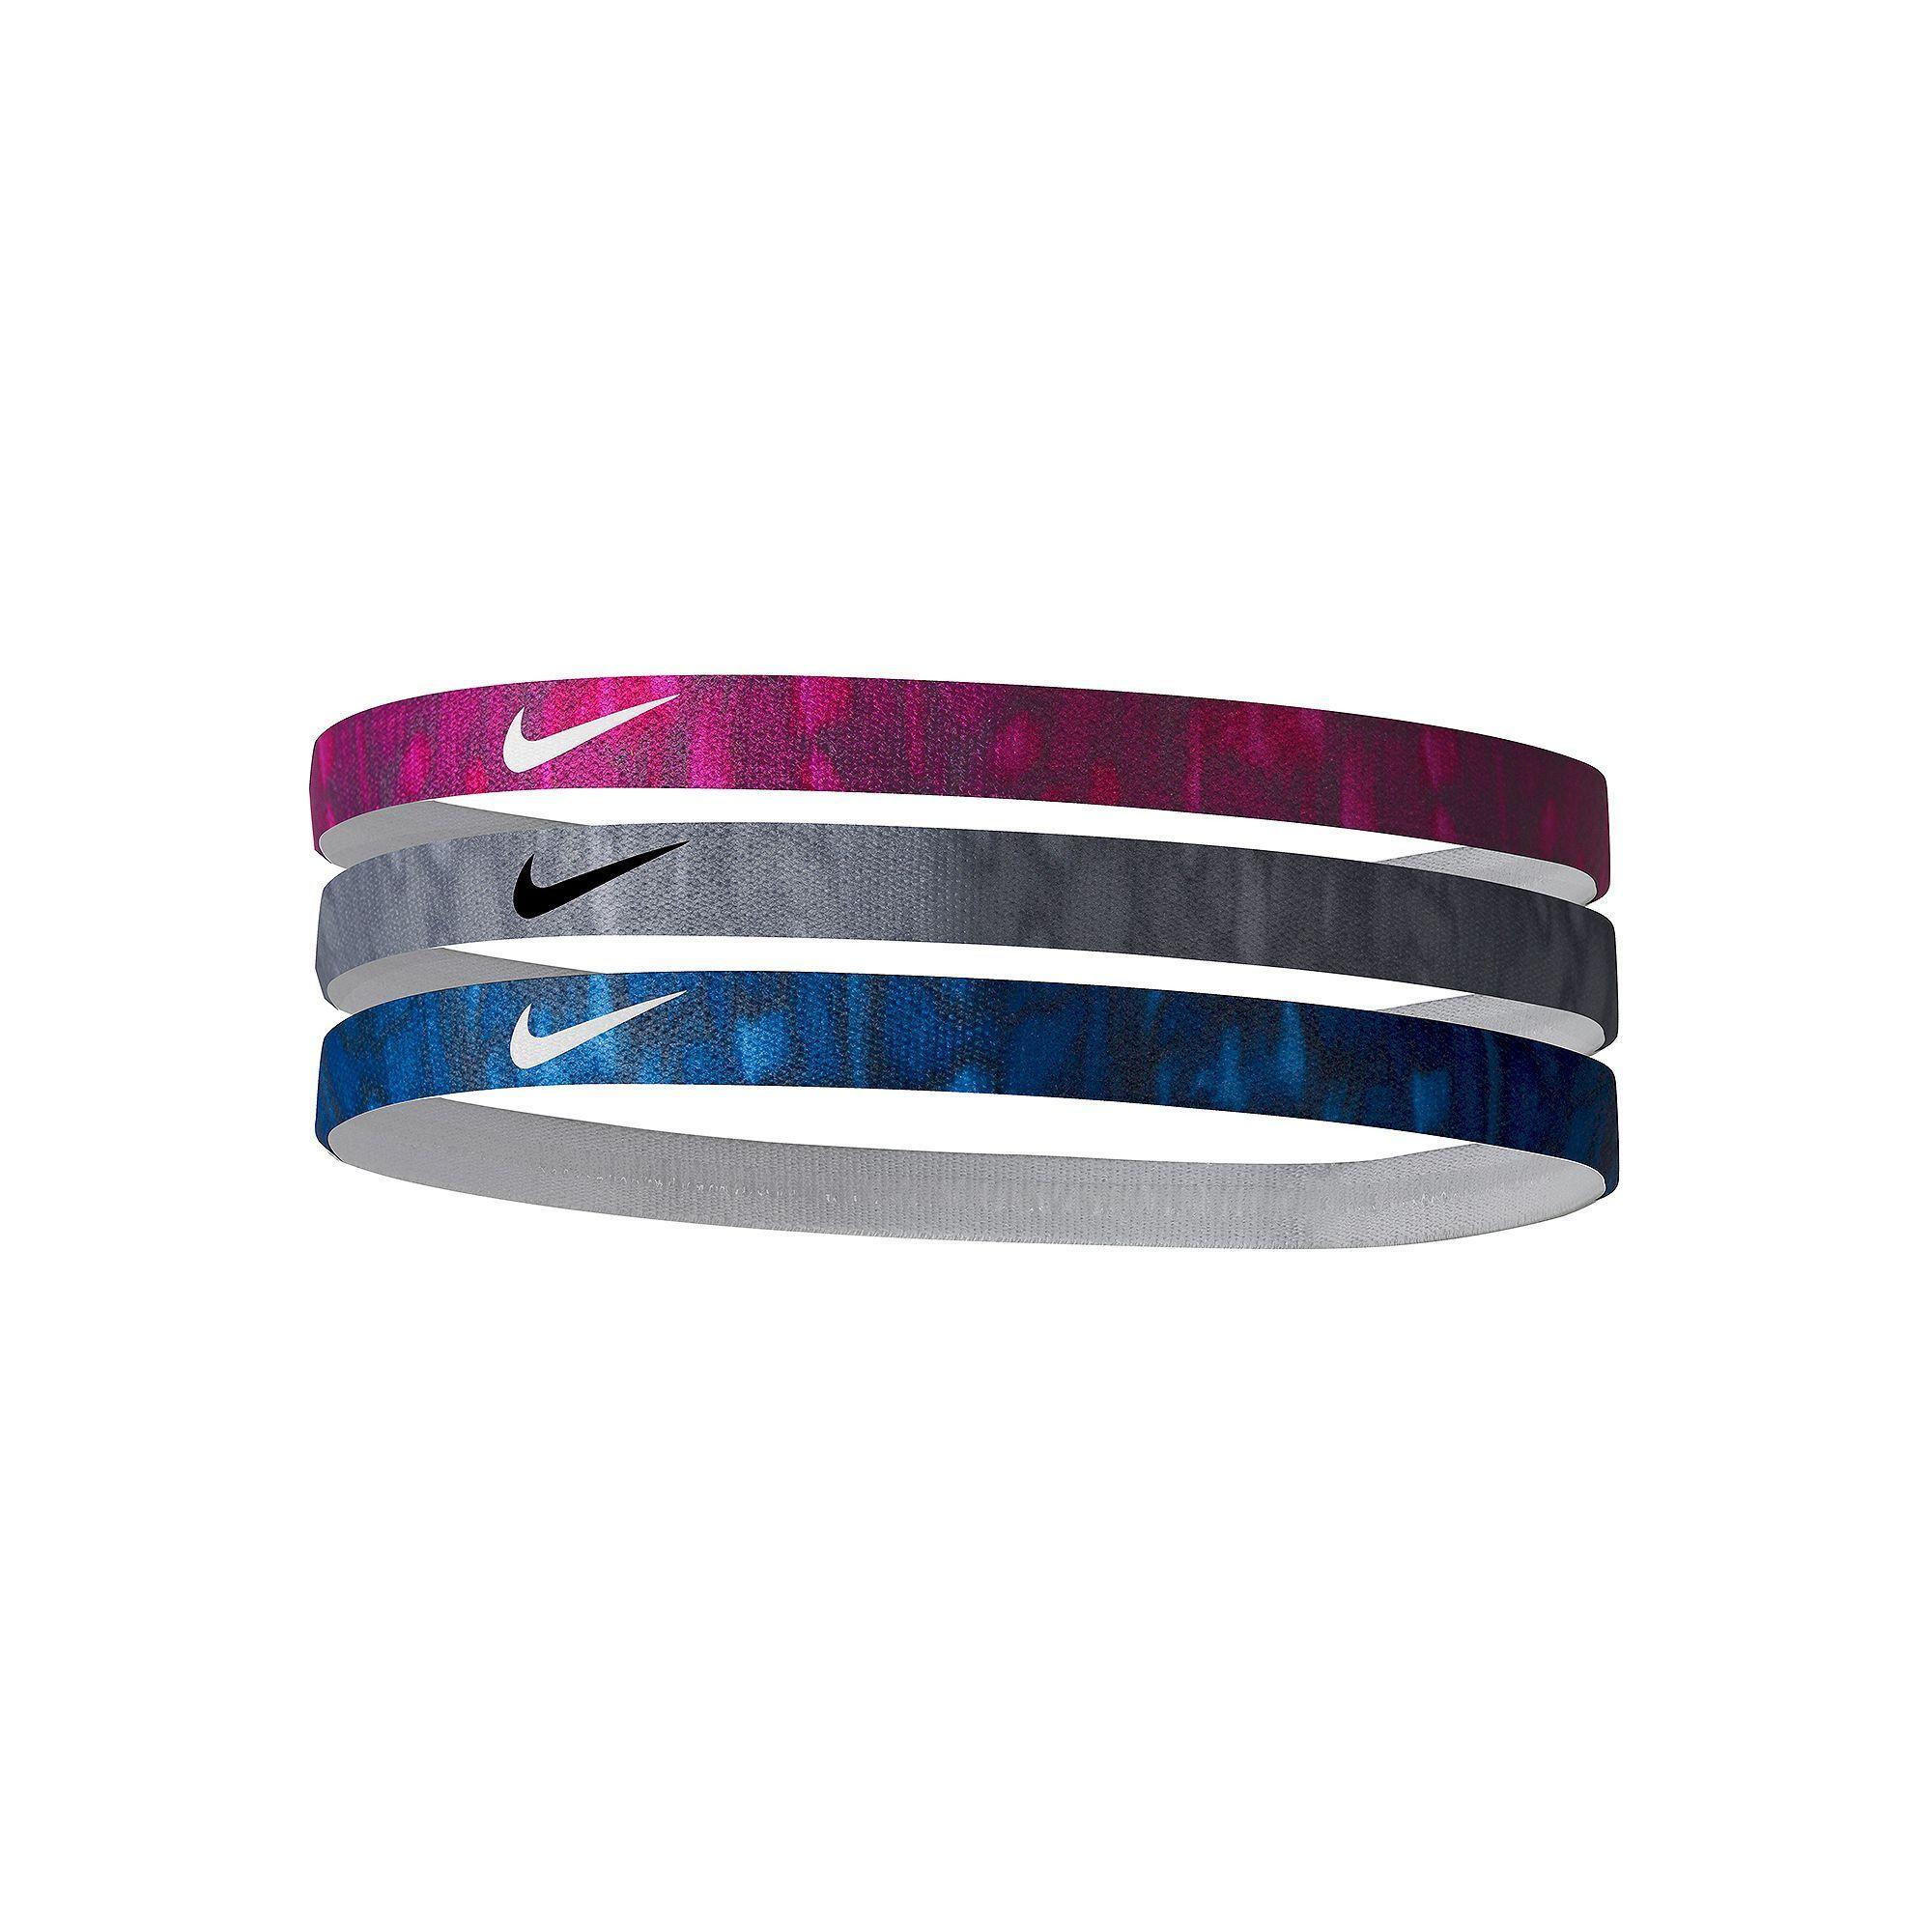 Nike 3-pk. Assorted Headband Set c485c830b